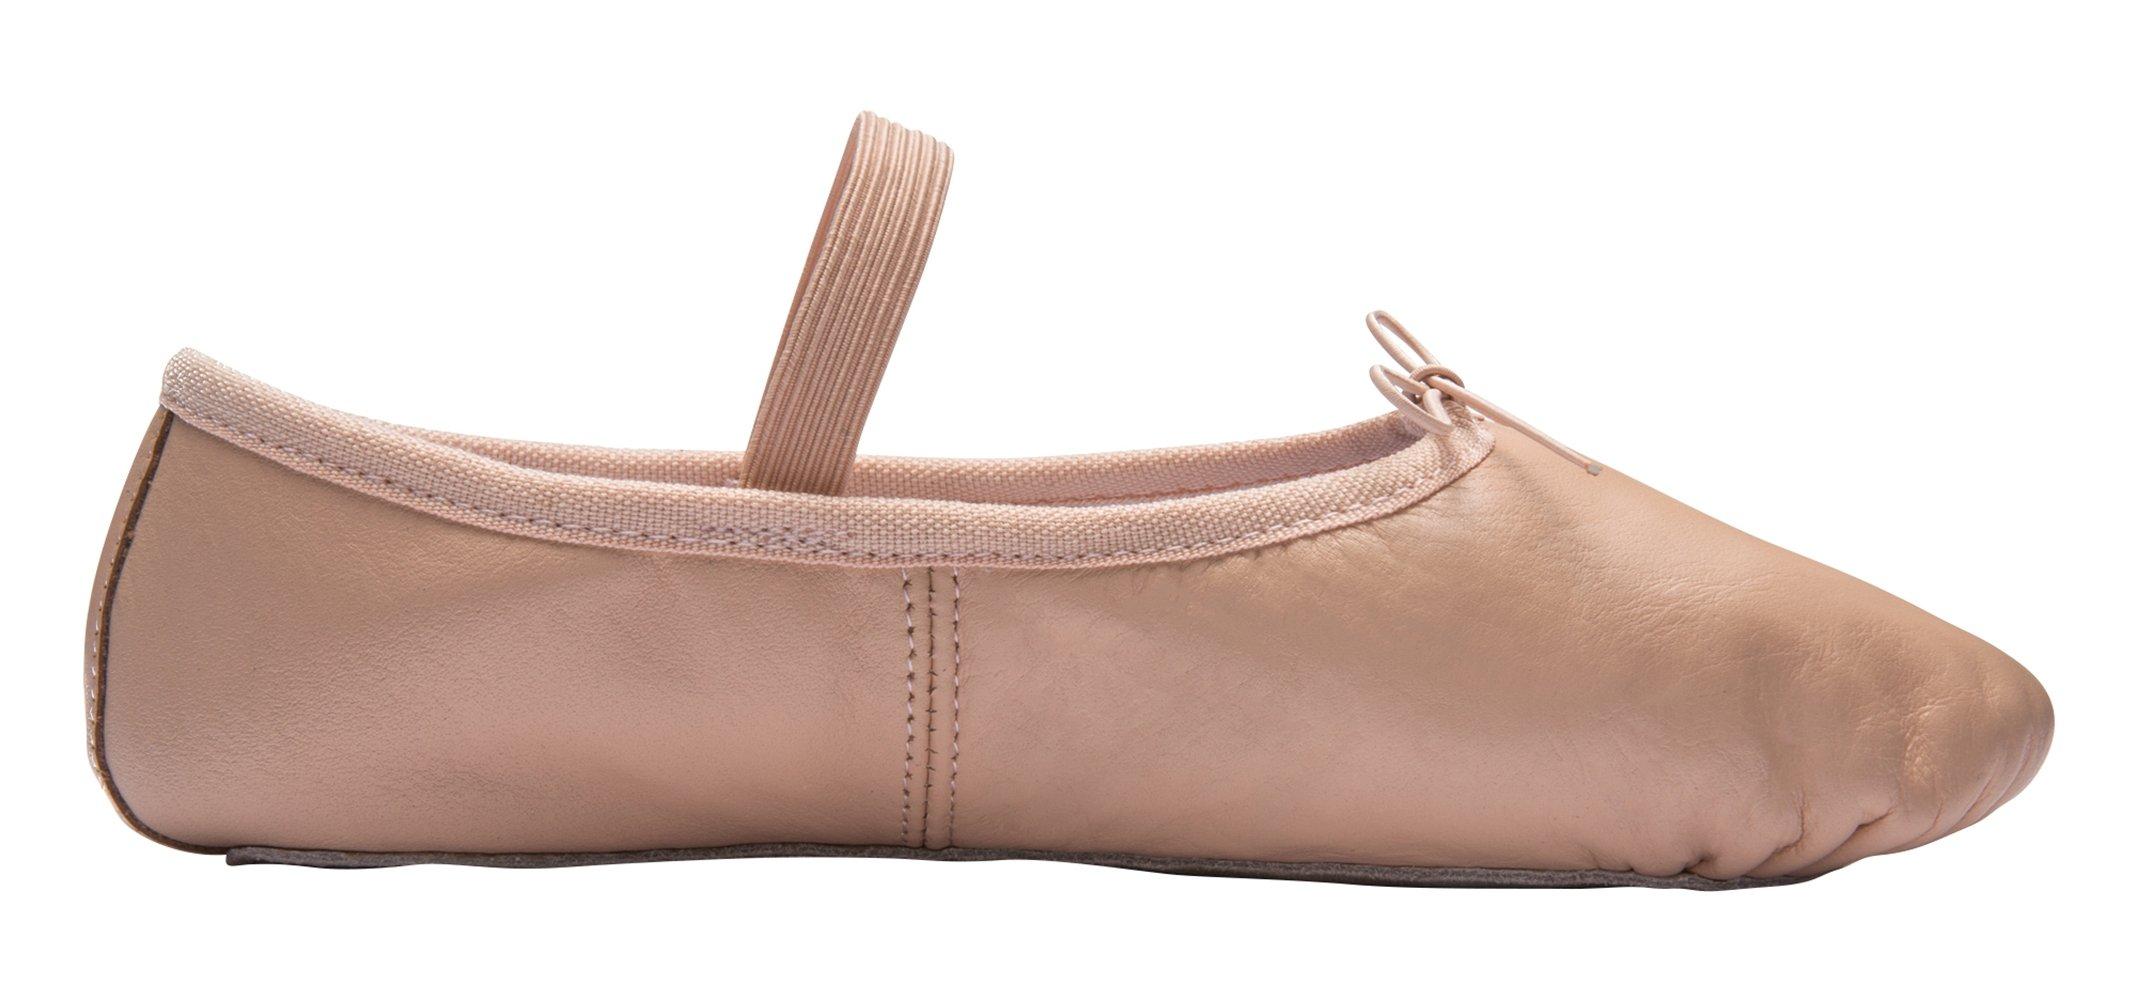 4c03ef657d7ef DWS Ballet Slippers 1003 Leather Ballerina Women`s Dance Shoes Girls ...